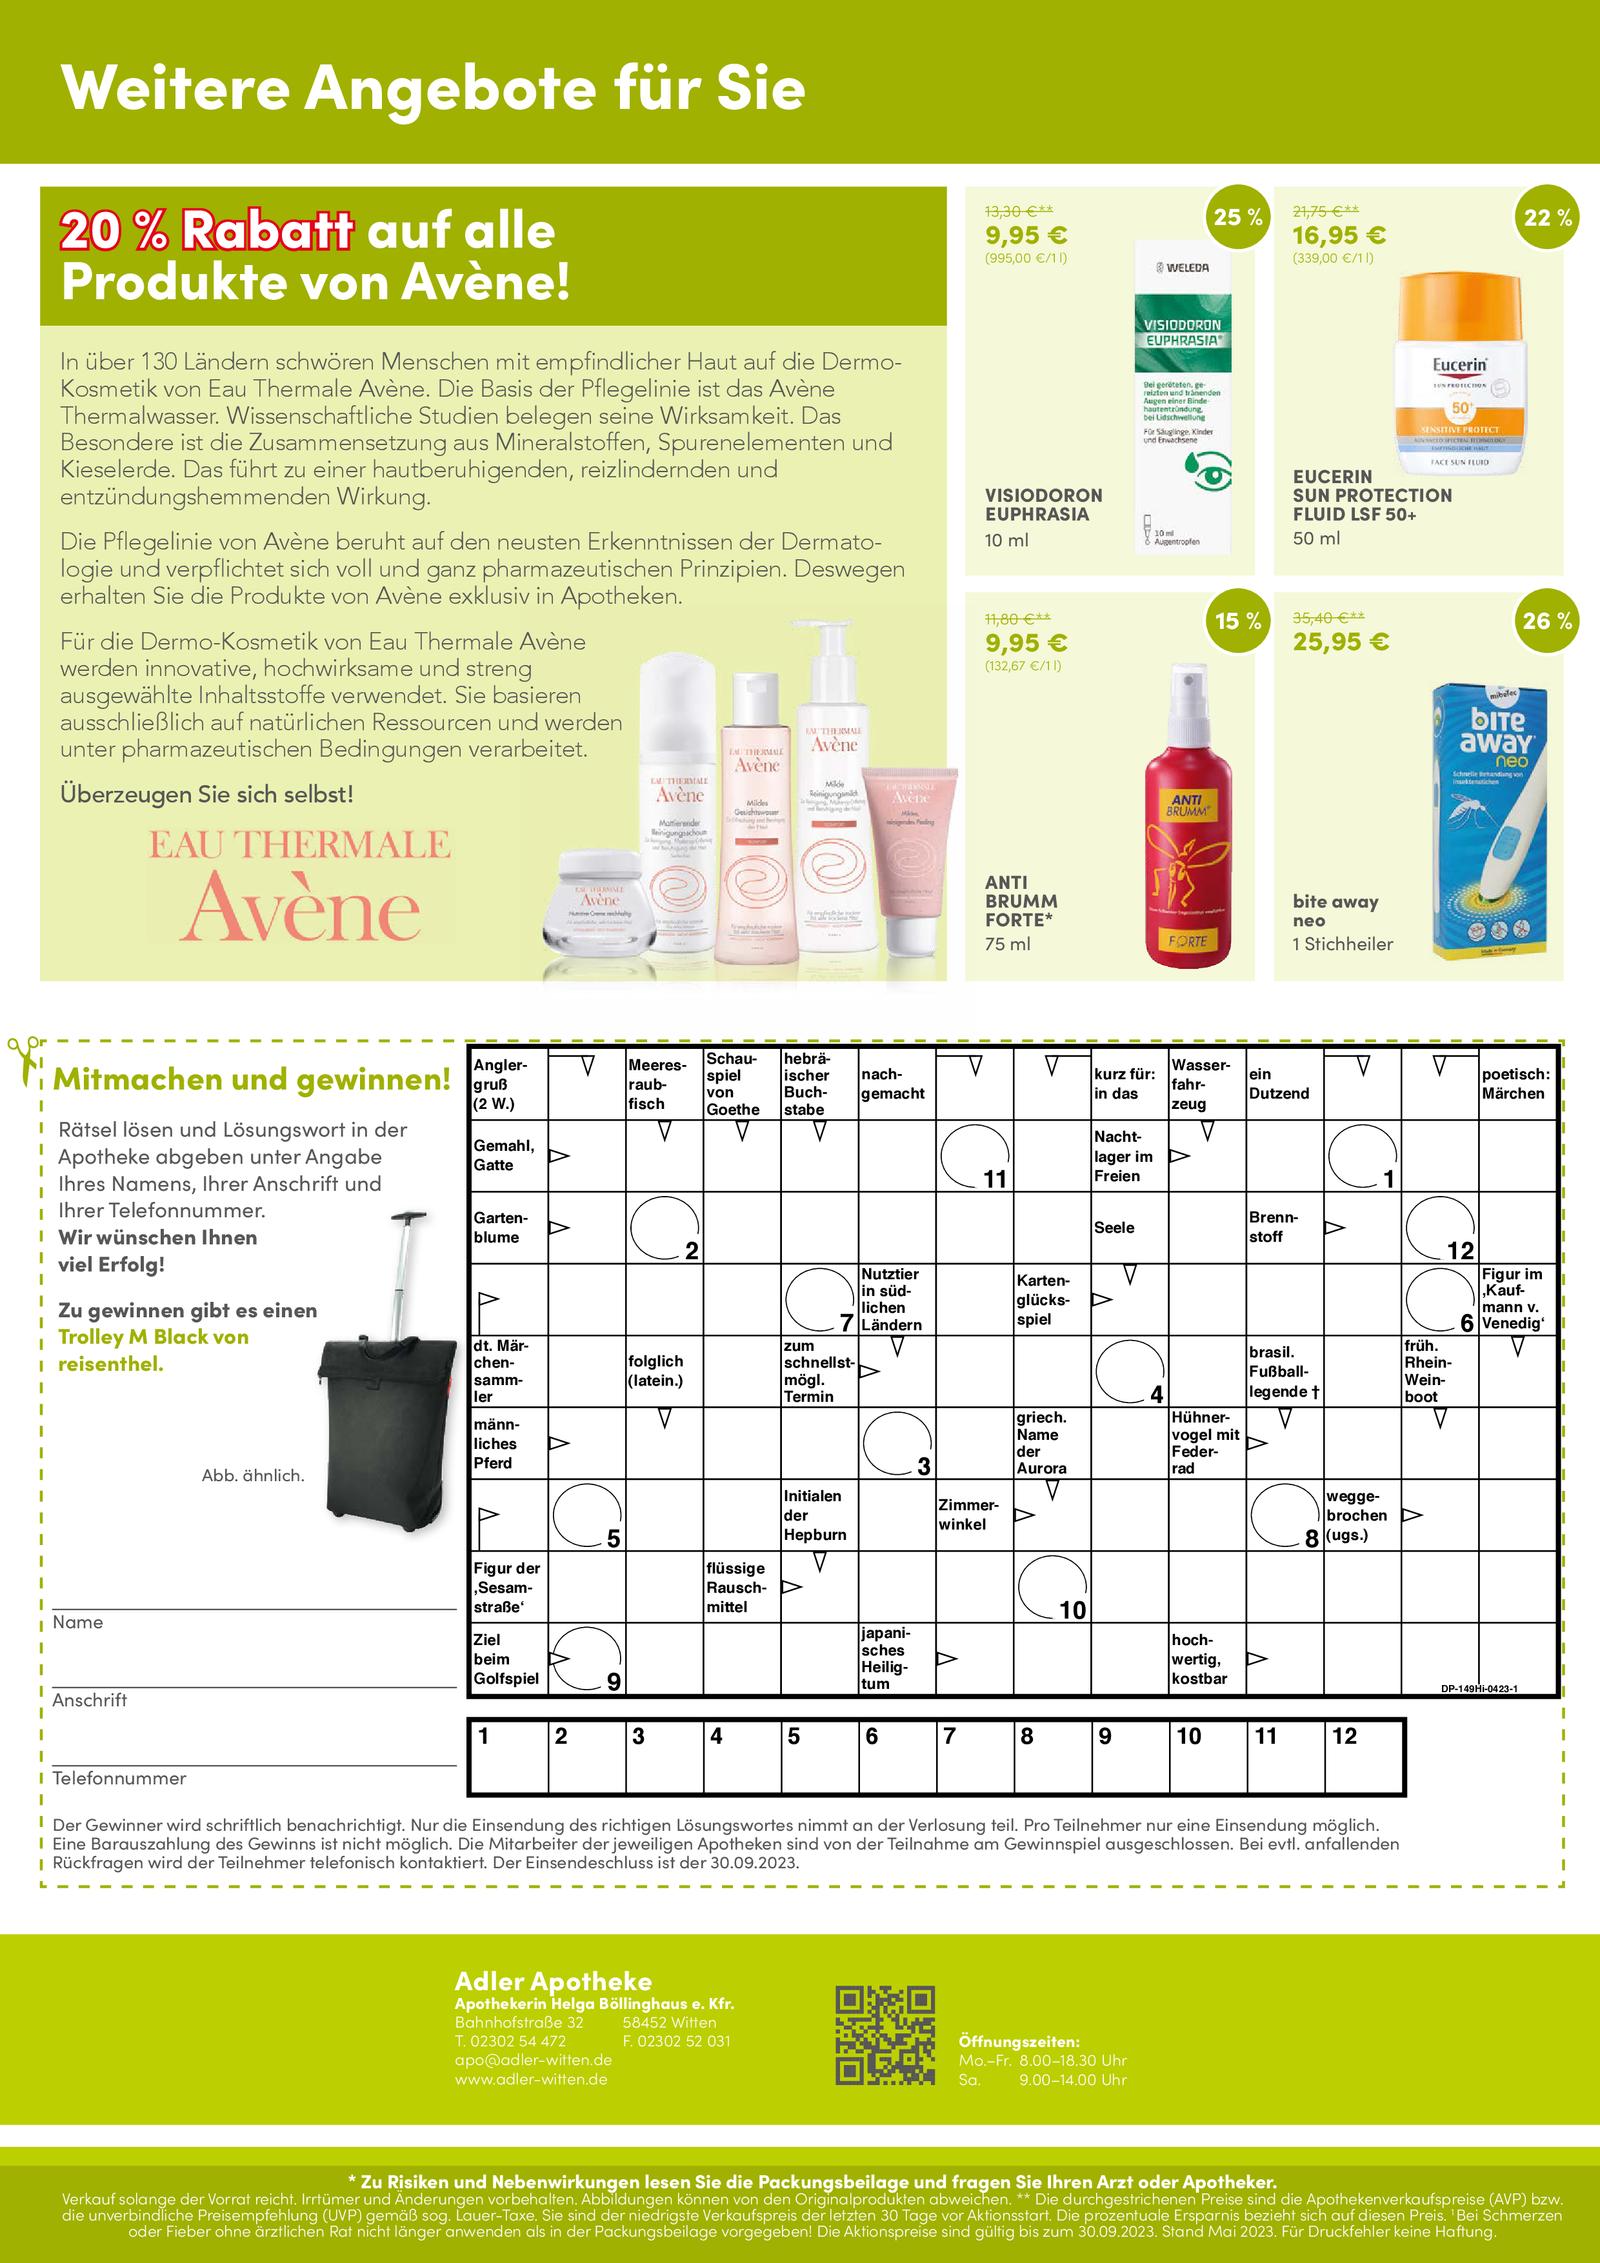 https://mein-uploads.apocdn.net/96/leaflets/96_flyer-Seite2.png